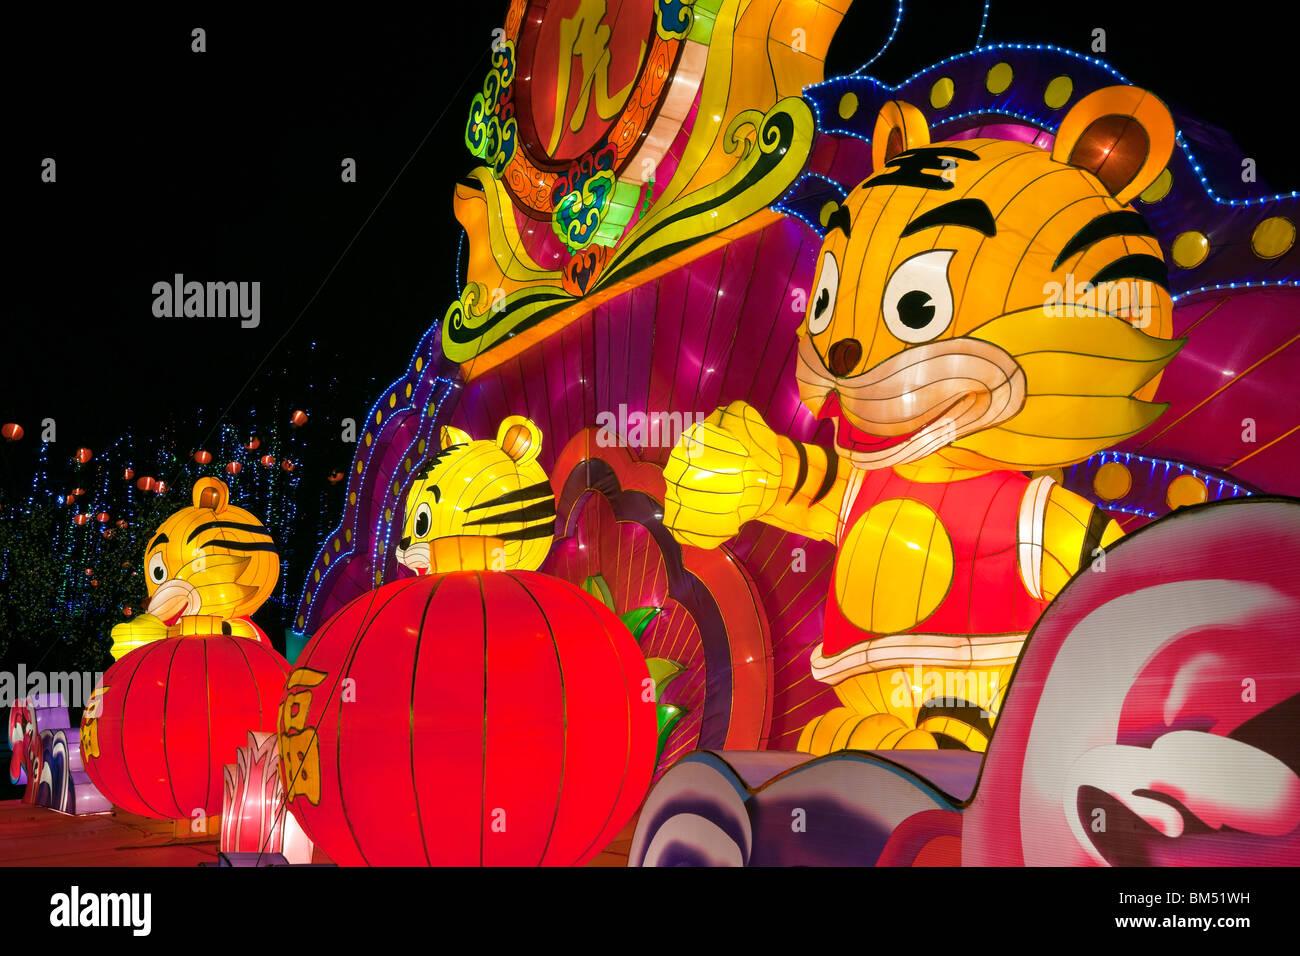 Singapore, Chinese New Year, Illuminated display, Year of the Tiger. - Stock Image